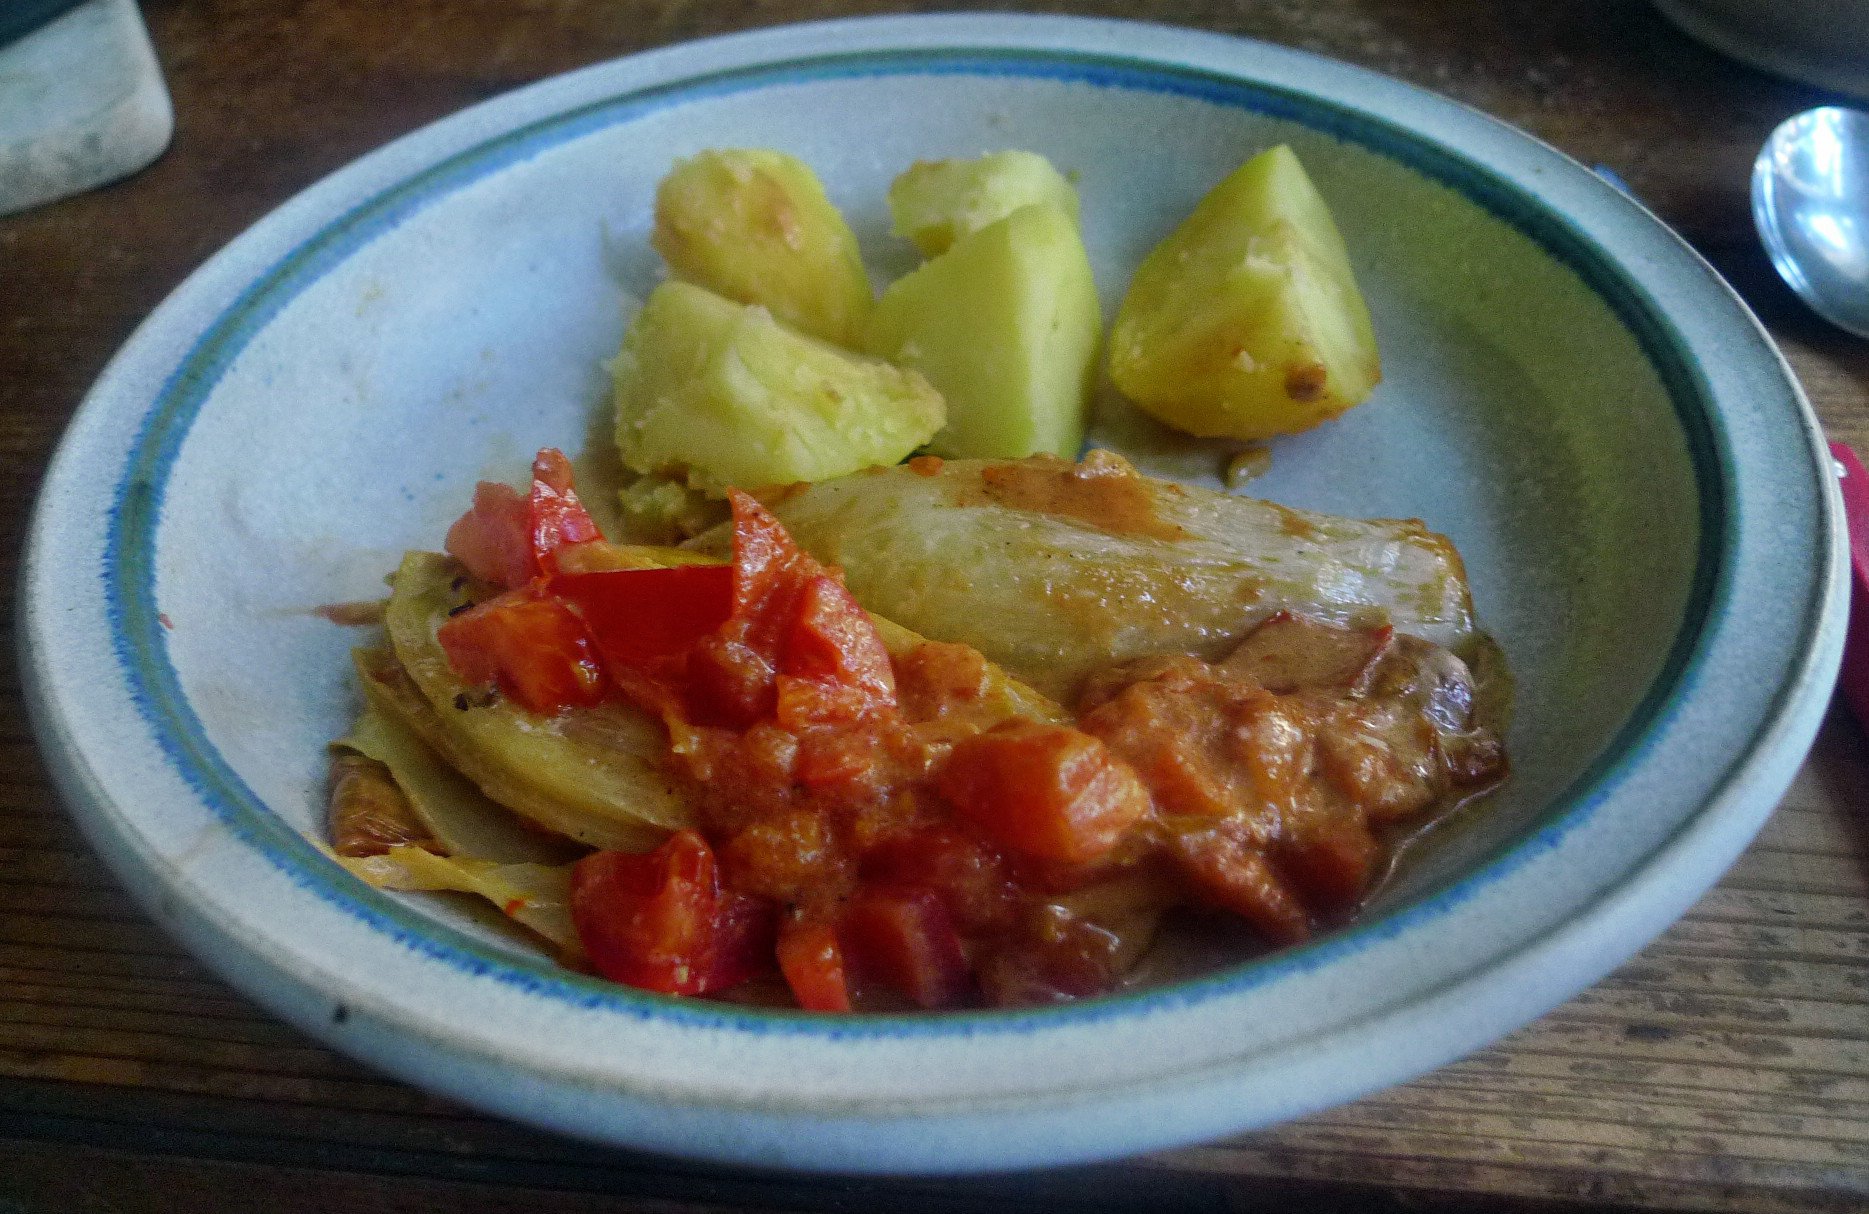 Chicoree,Salzkartoffeln,Pflaumenkompott,vegetarisch - 28.2.15   (10)